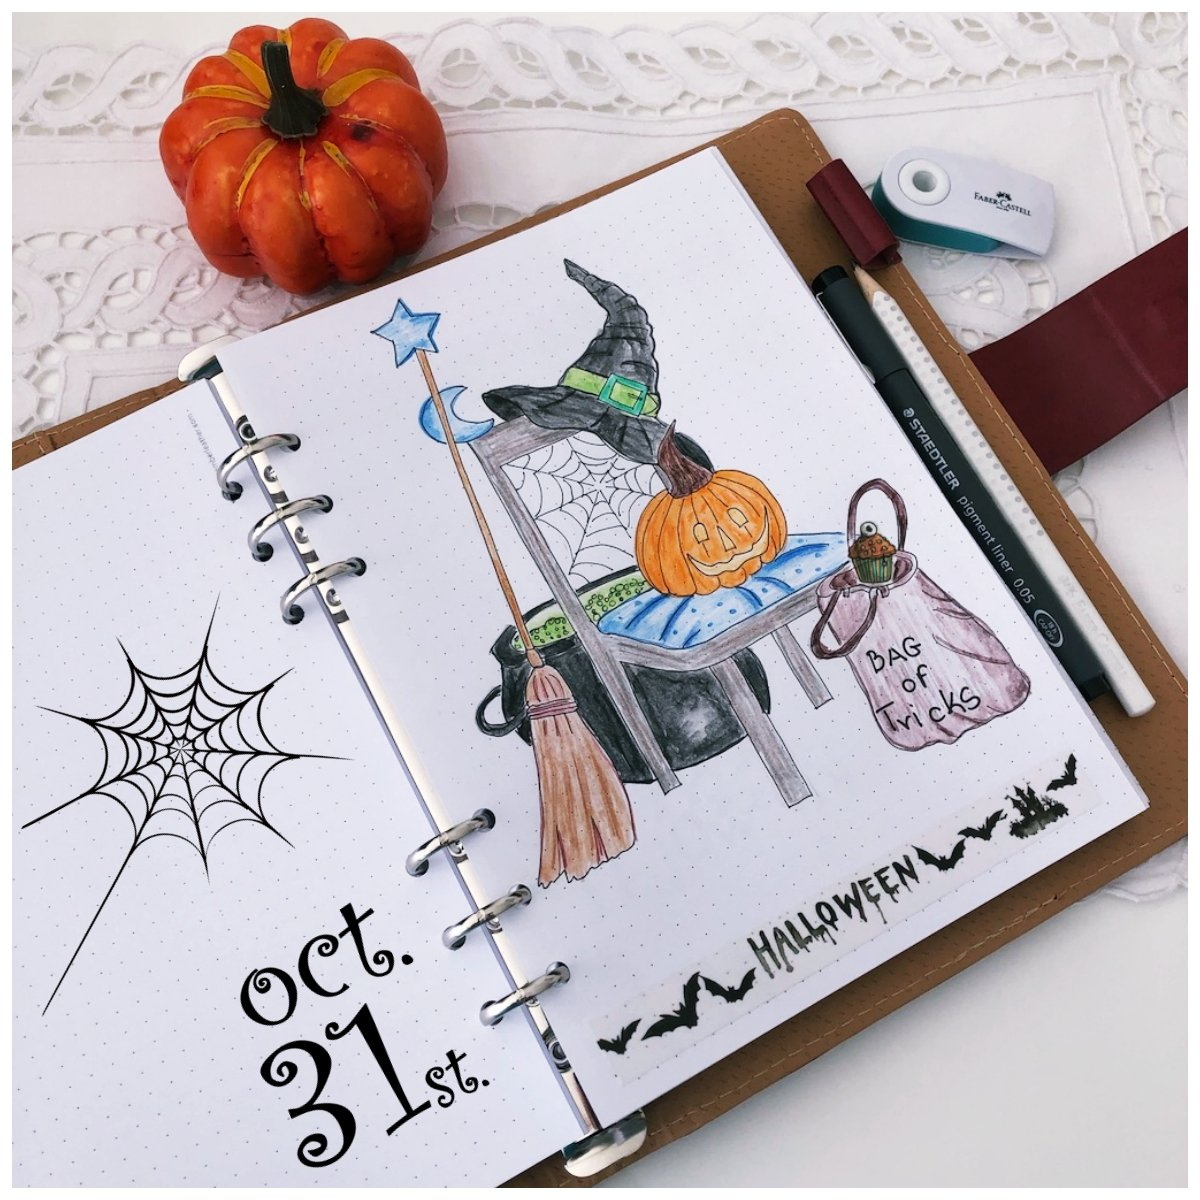 Bullet journal - Halloween - itstartswithacoffee.com #bulletjournal #bujo #halloween